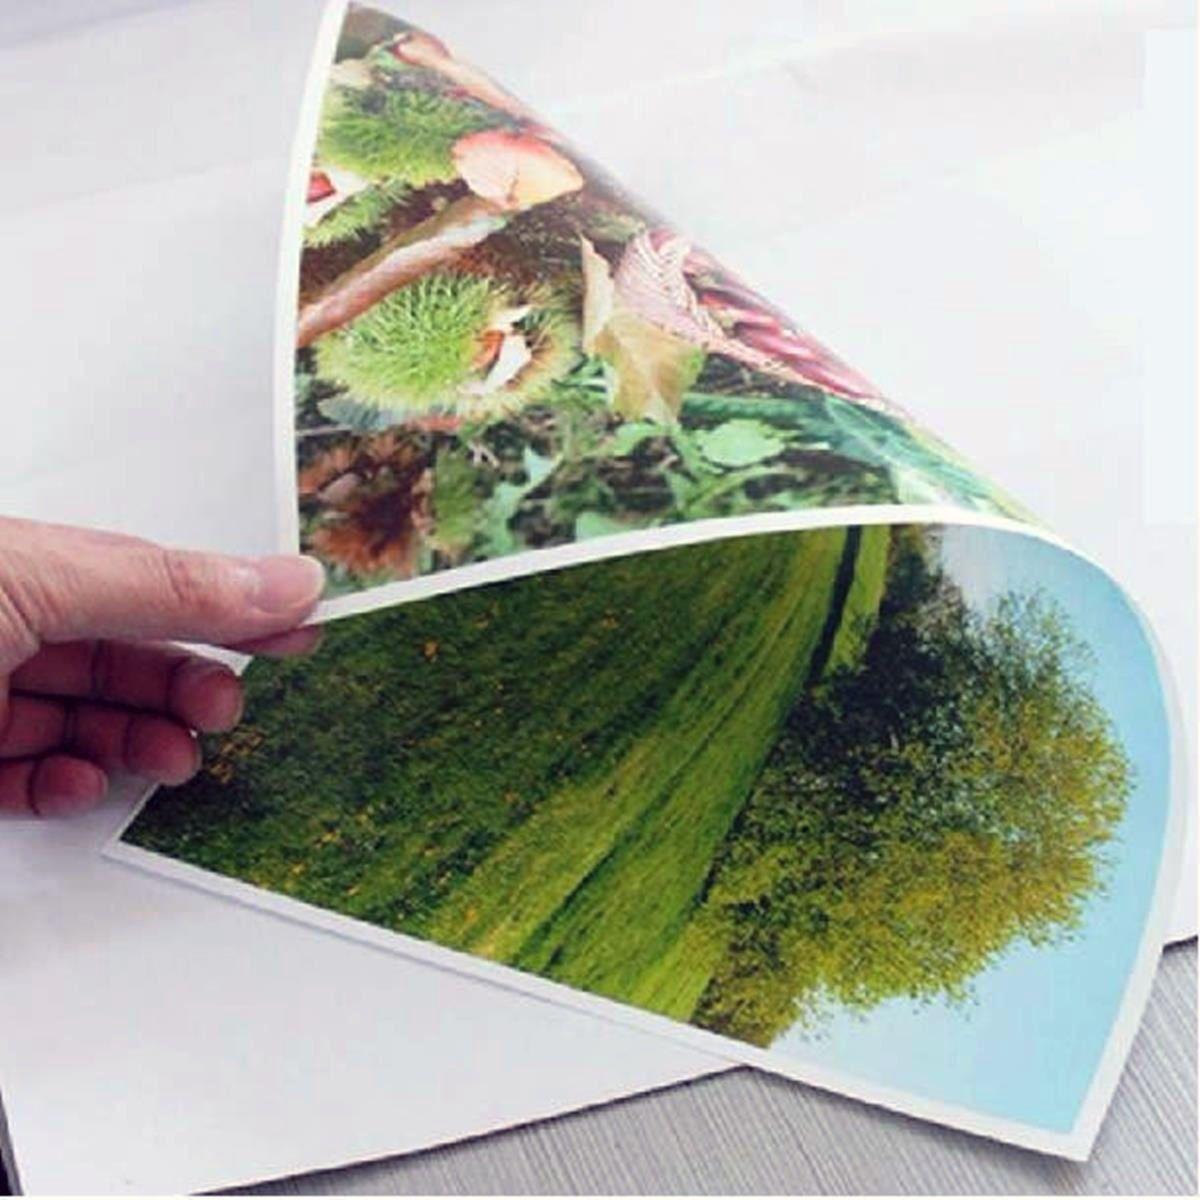 Papel Fotográfico A4 Dupla Face 220g Glossy Branco Brilhante Resistente à Água / 100 folhas